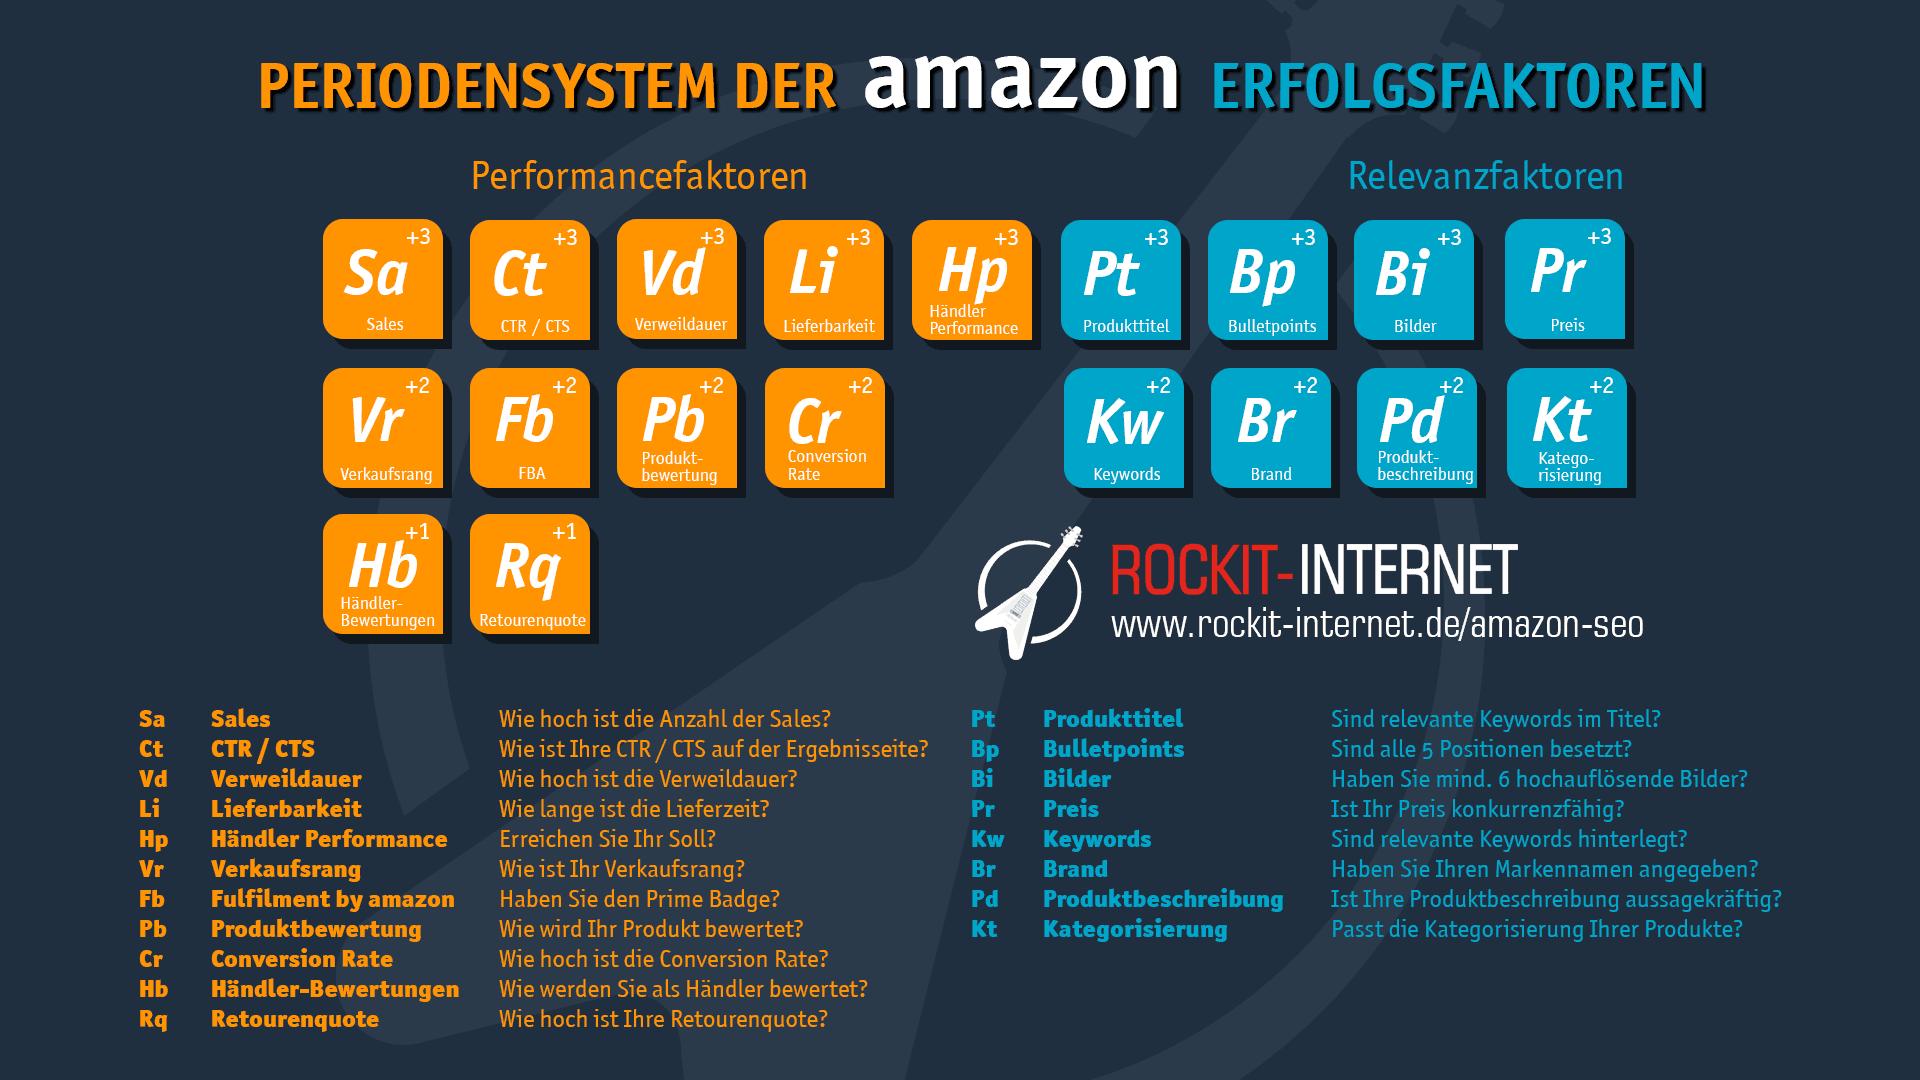 Periodensystem der Amazon Erfolgsfaktoren